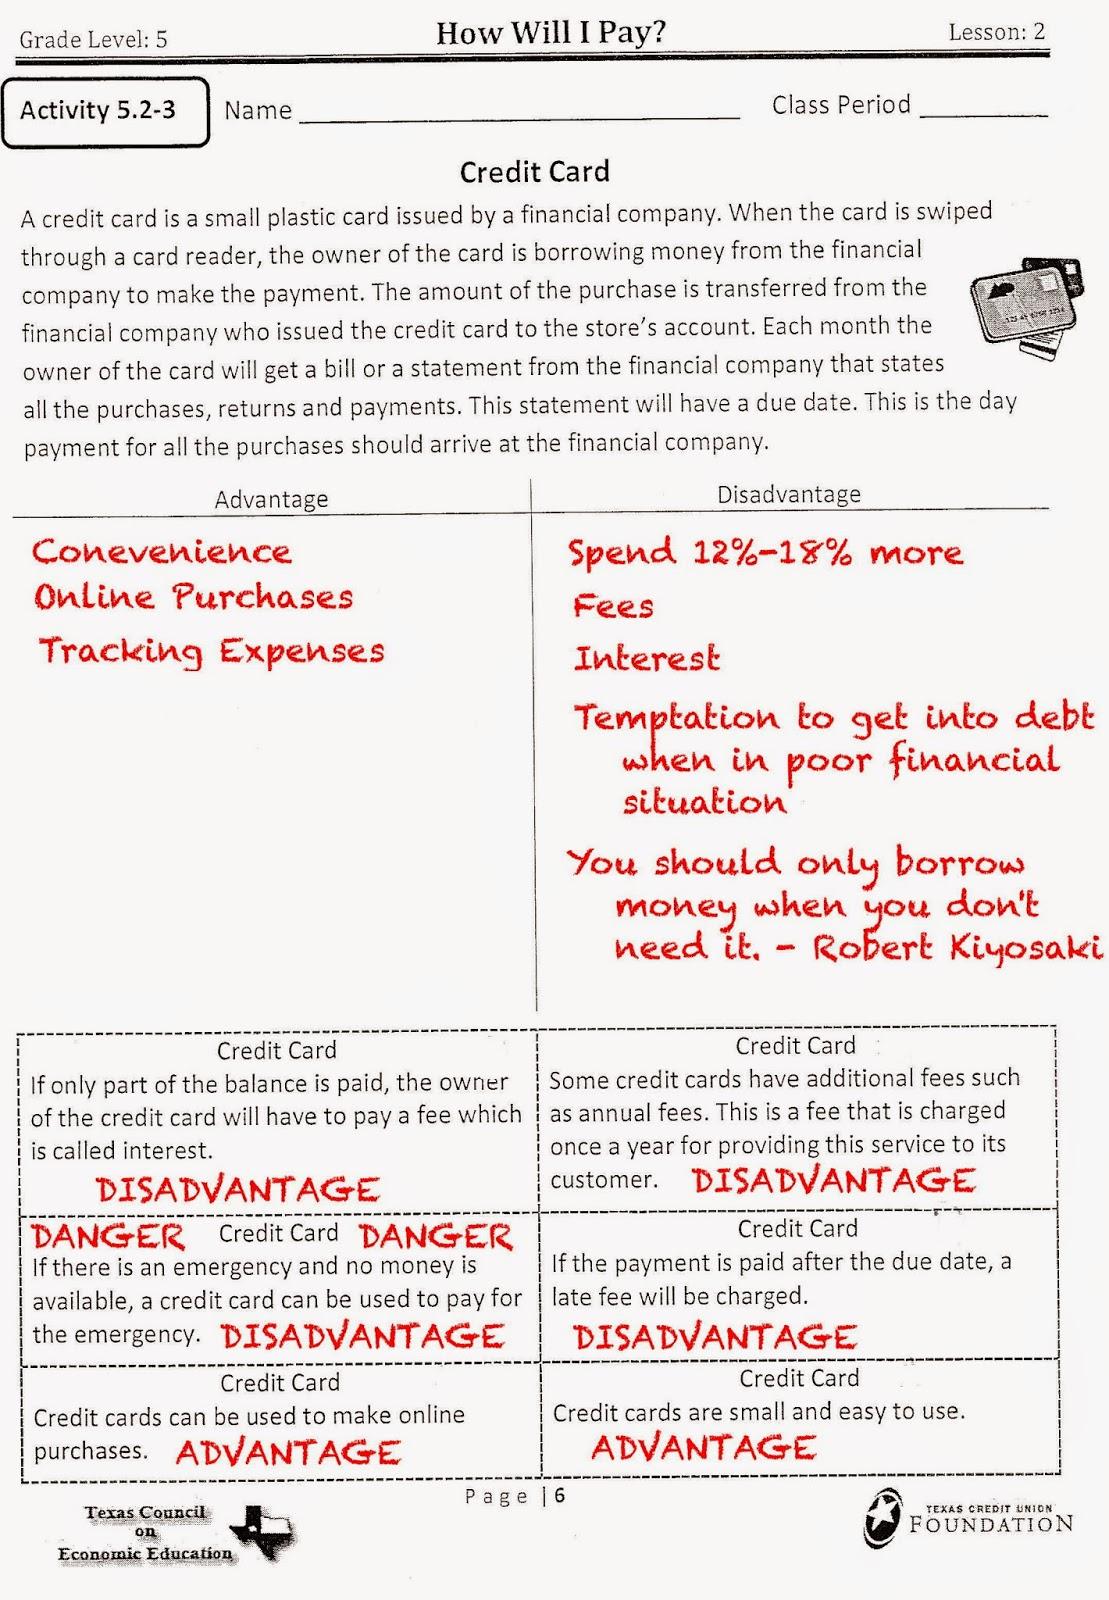 less homework persuasive essay essay topics ideas kids less  less homework pros and cons best essay writing service personal statement help sheet